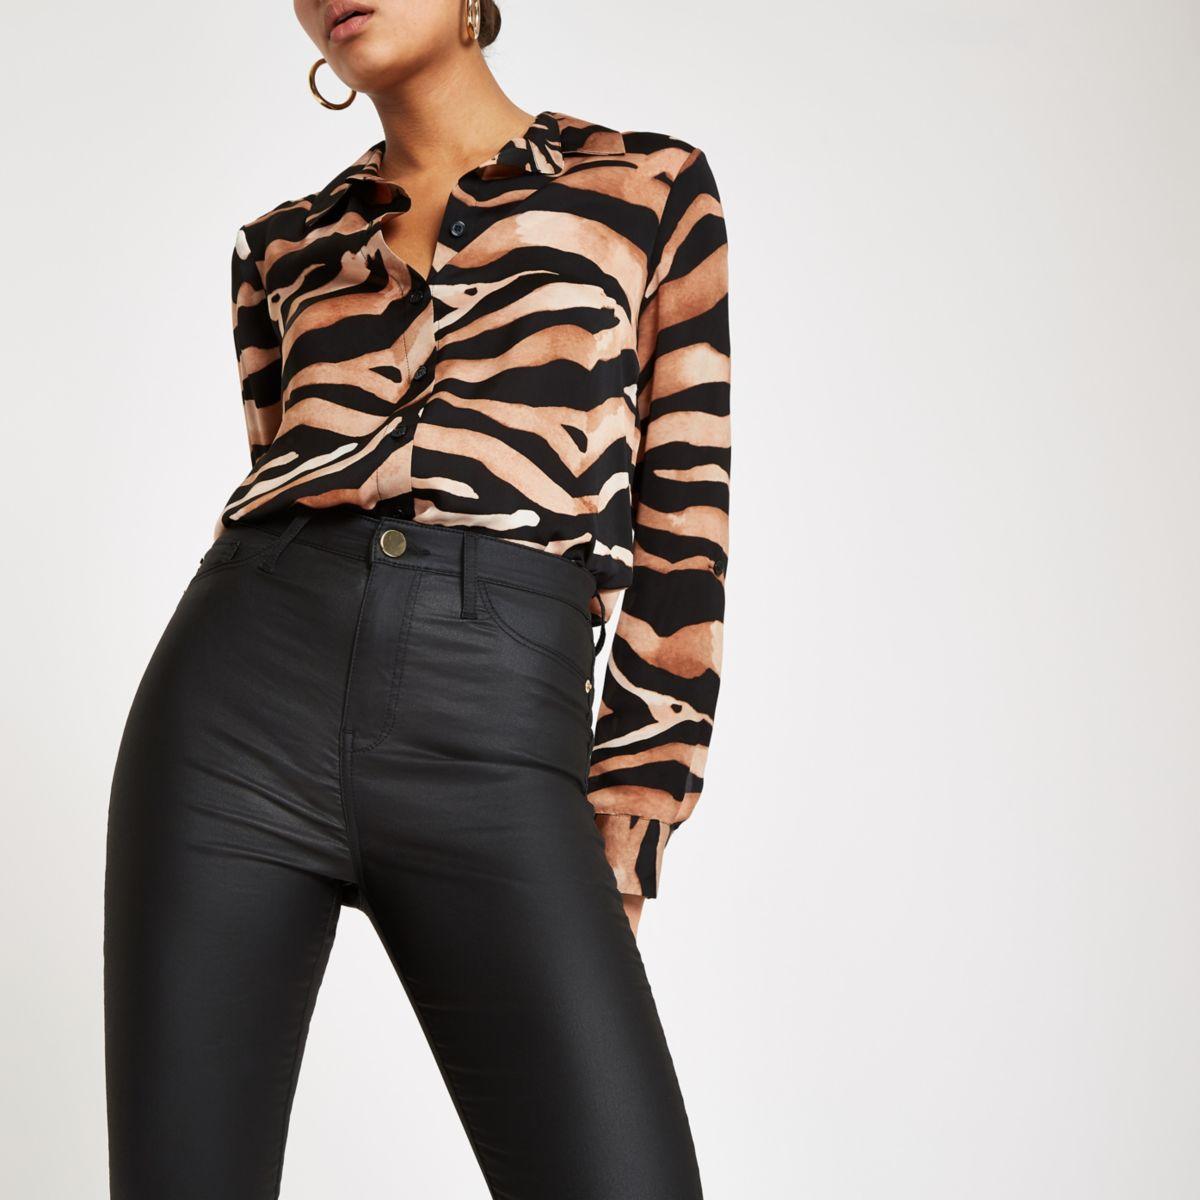 Harper - Zwarte gecoate skinny jeans met hoge taille